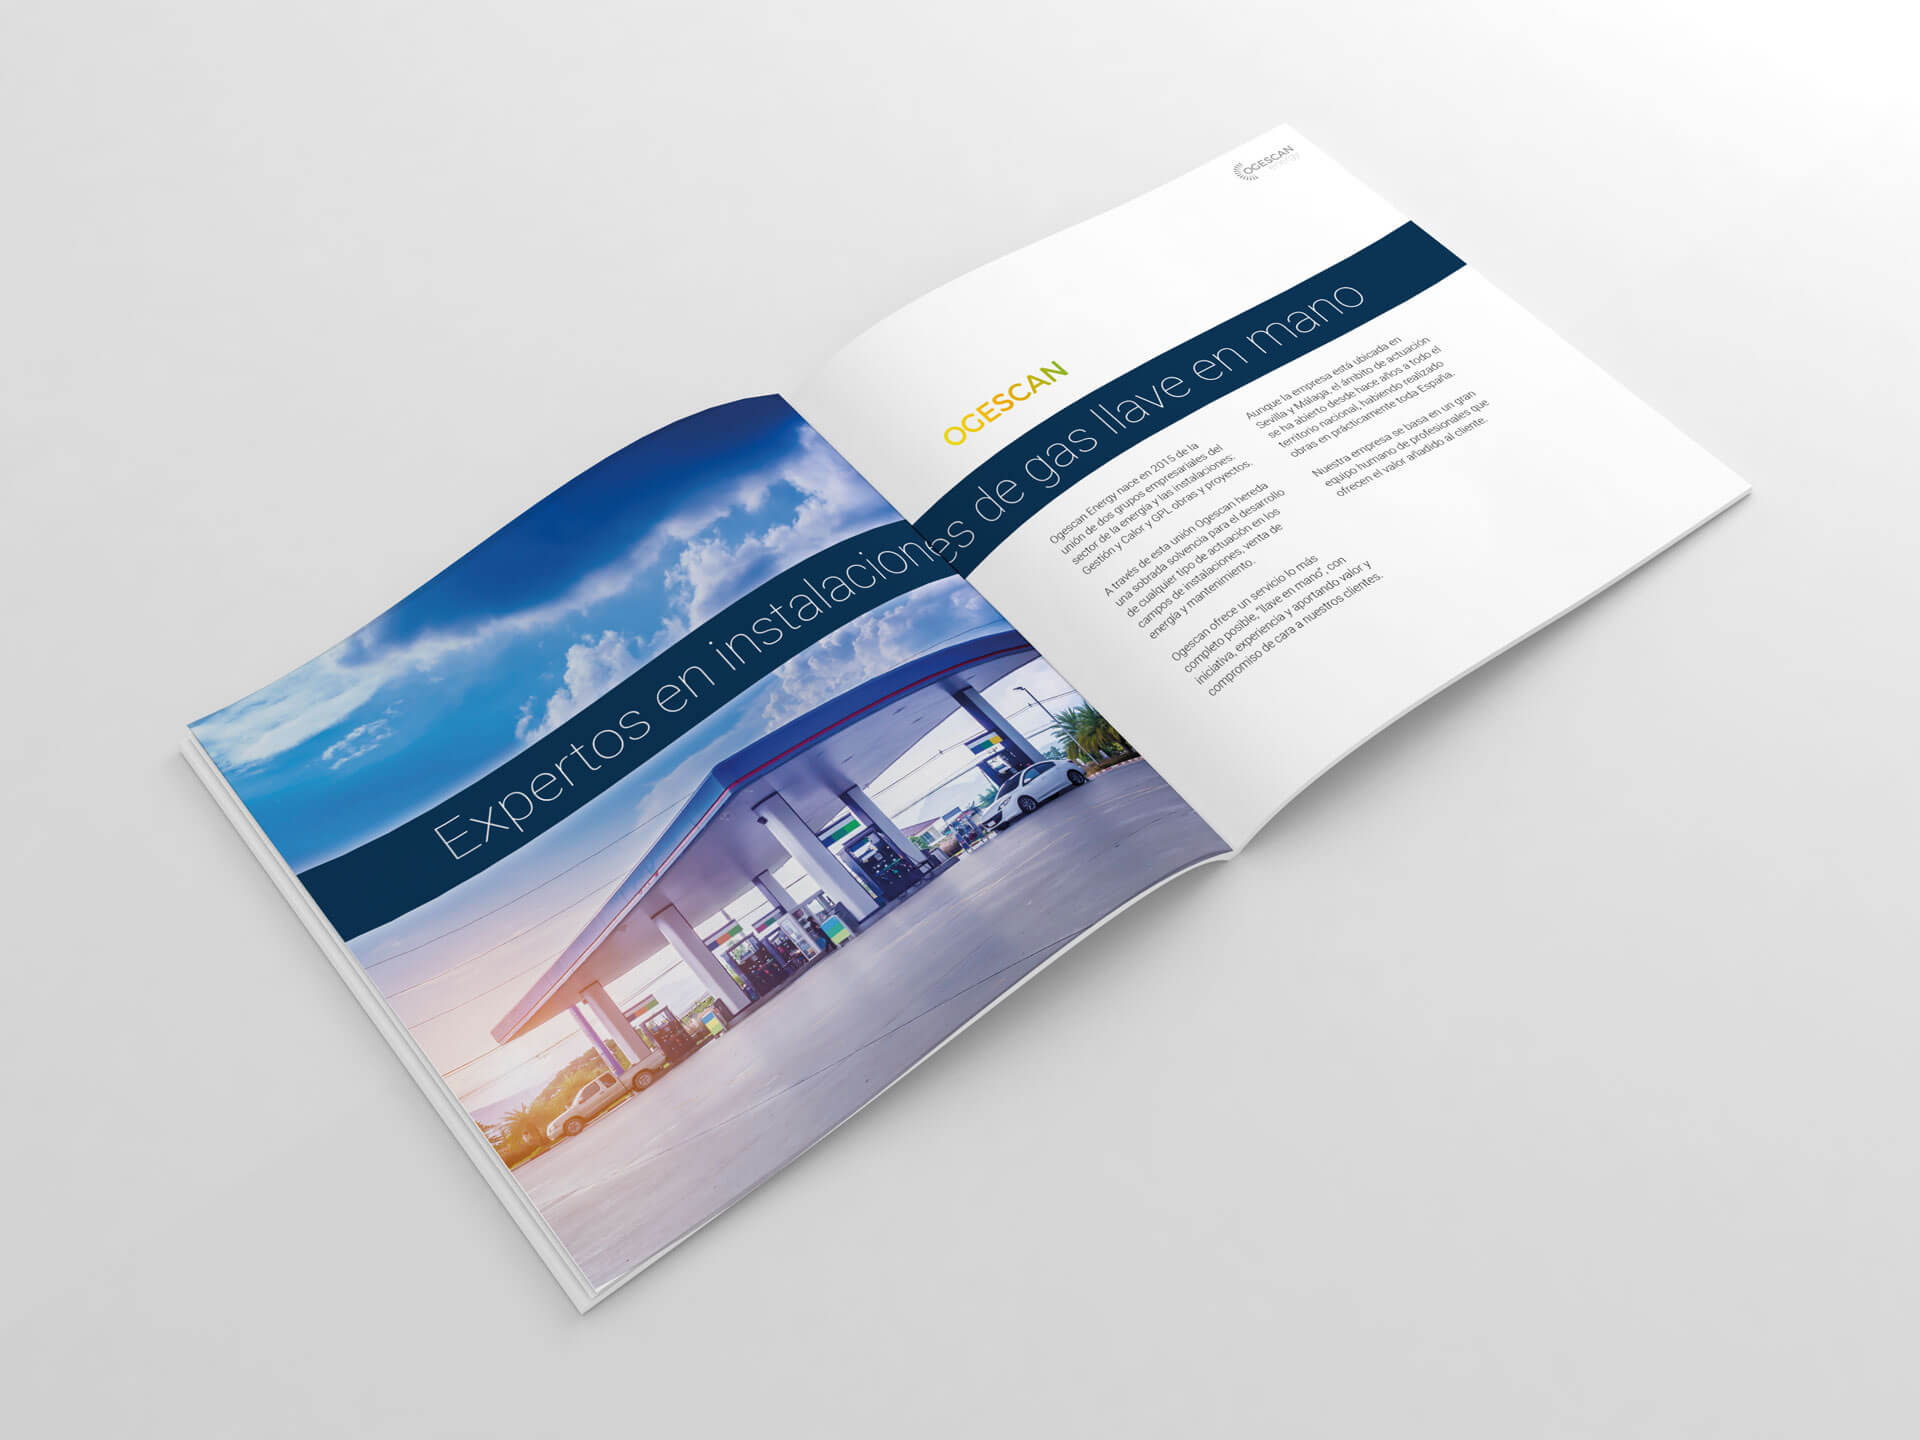 Diseño de dossier para Ogescan Energy